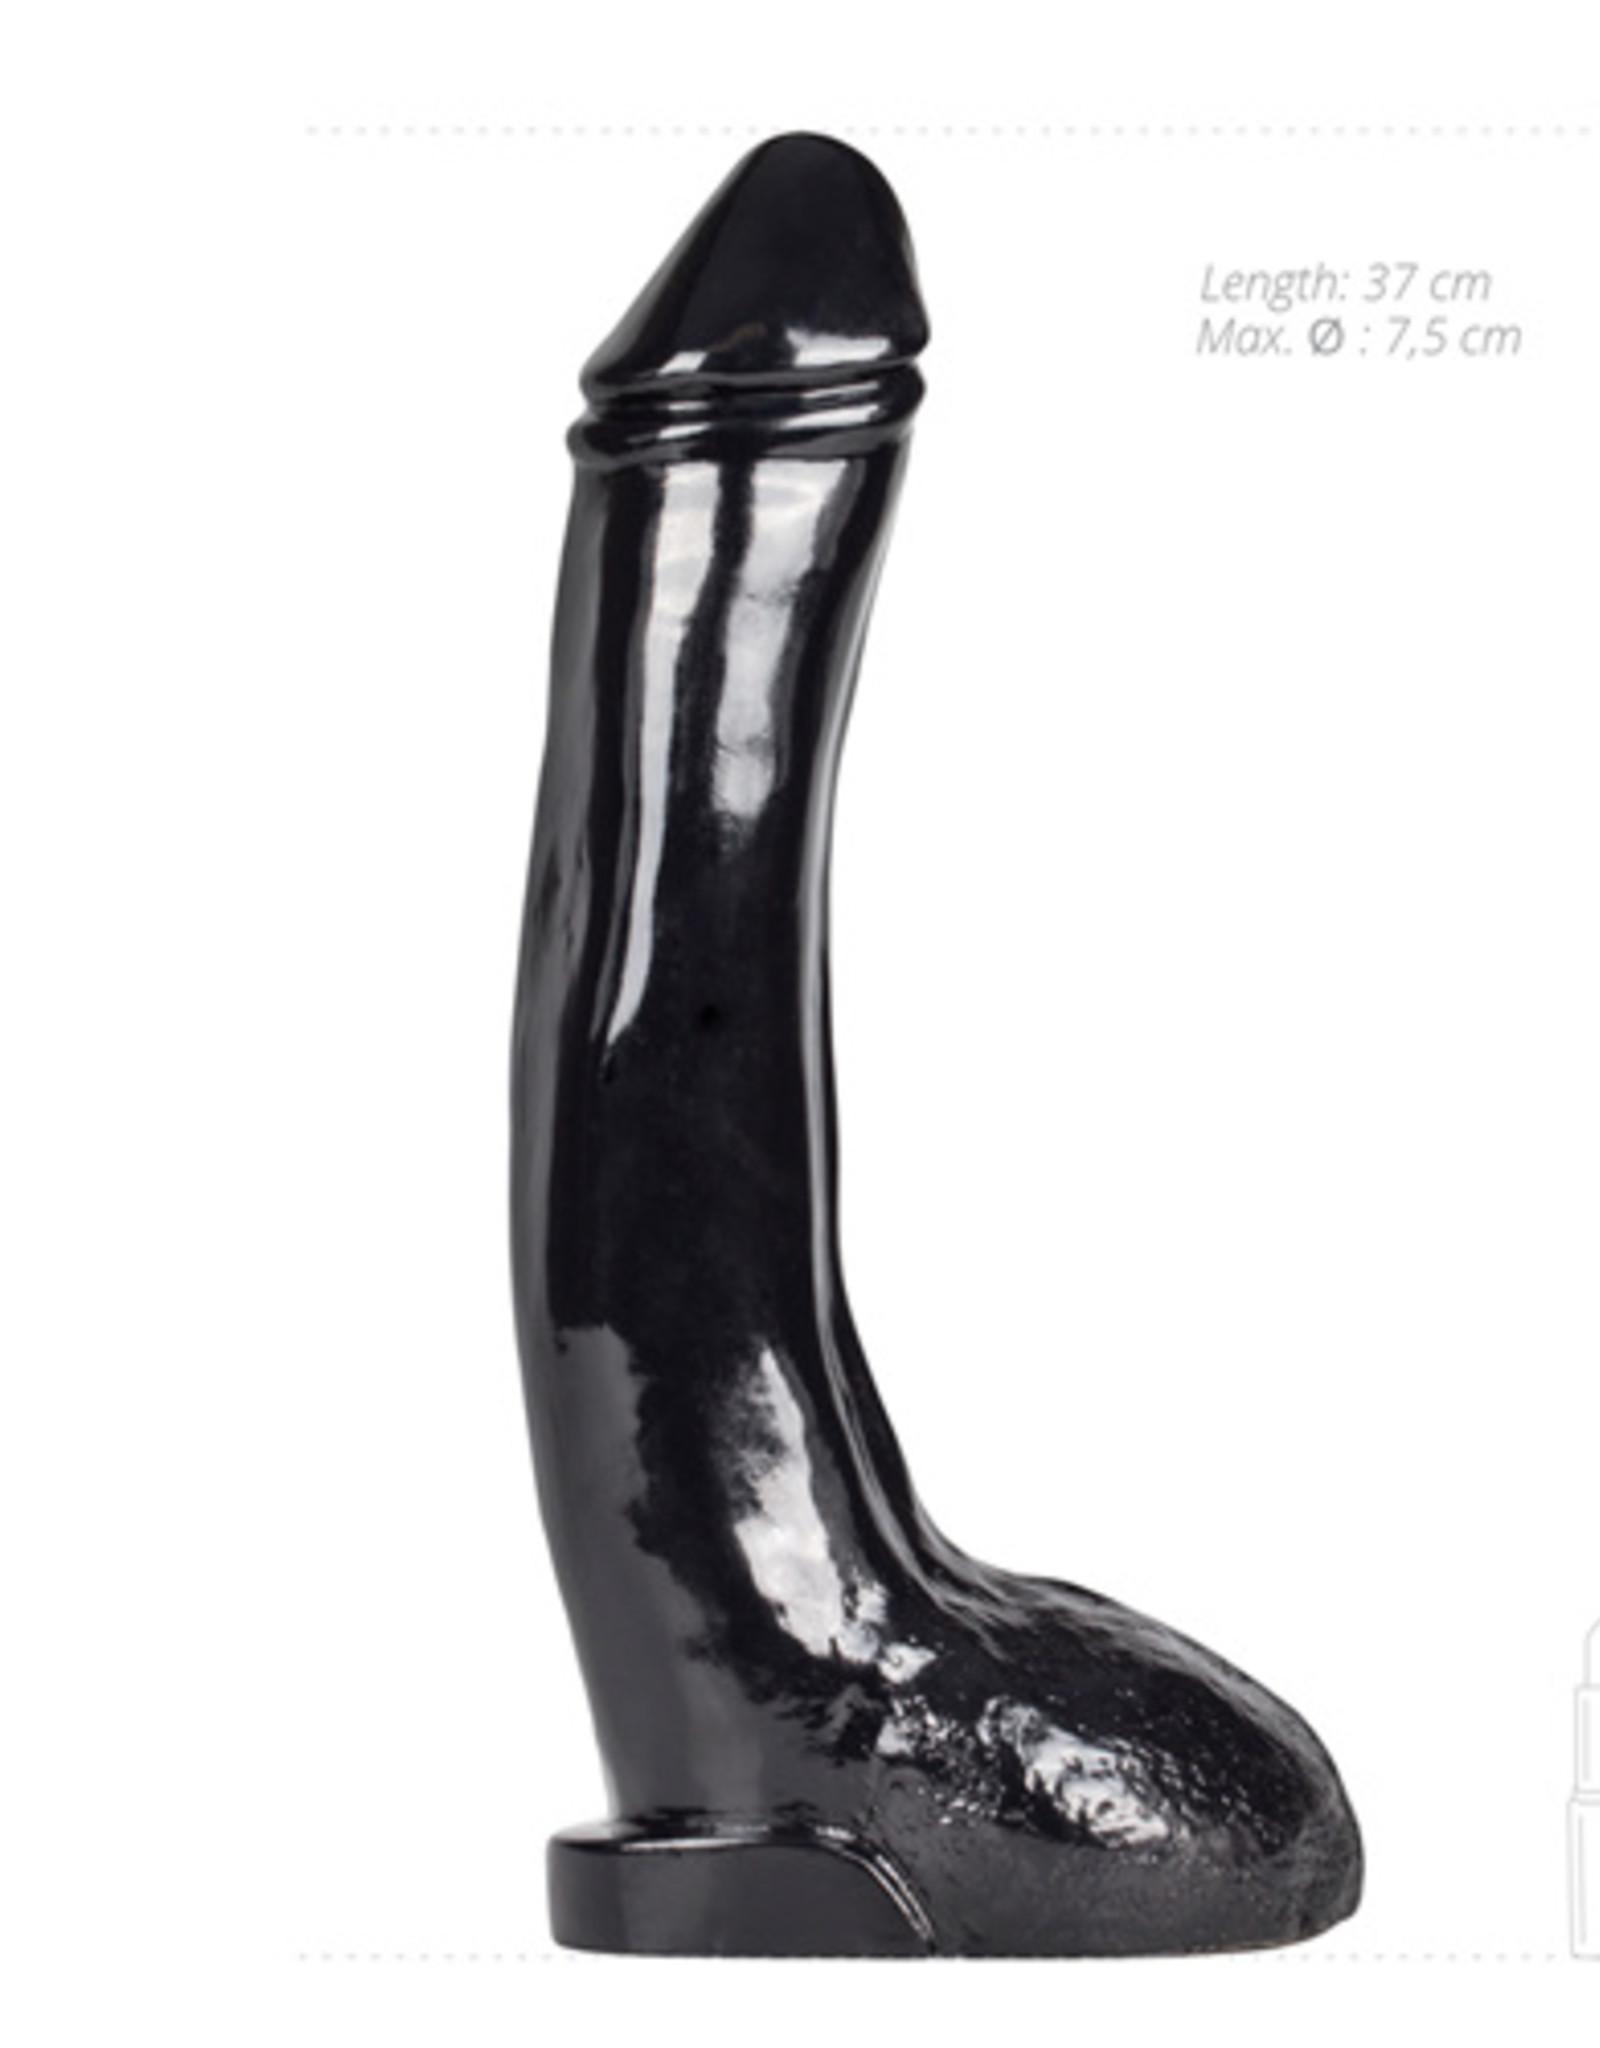 Master Series Enorme Trevor Realistische Dildo  - 35 cm